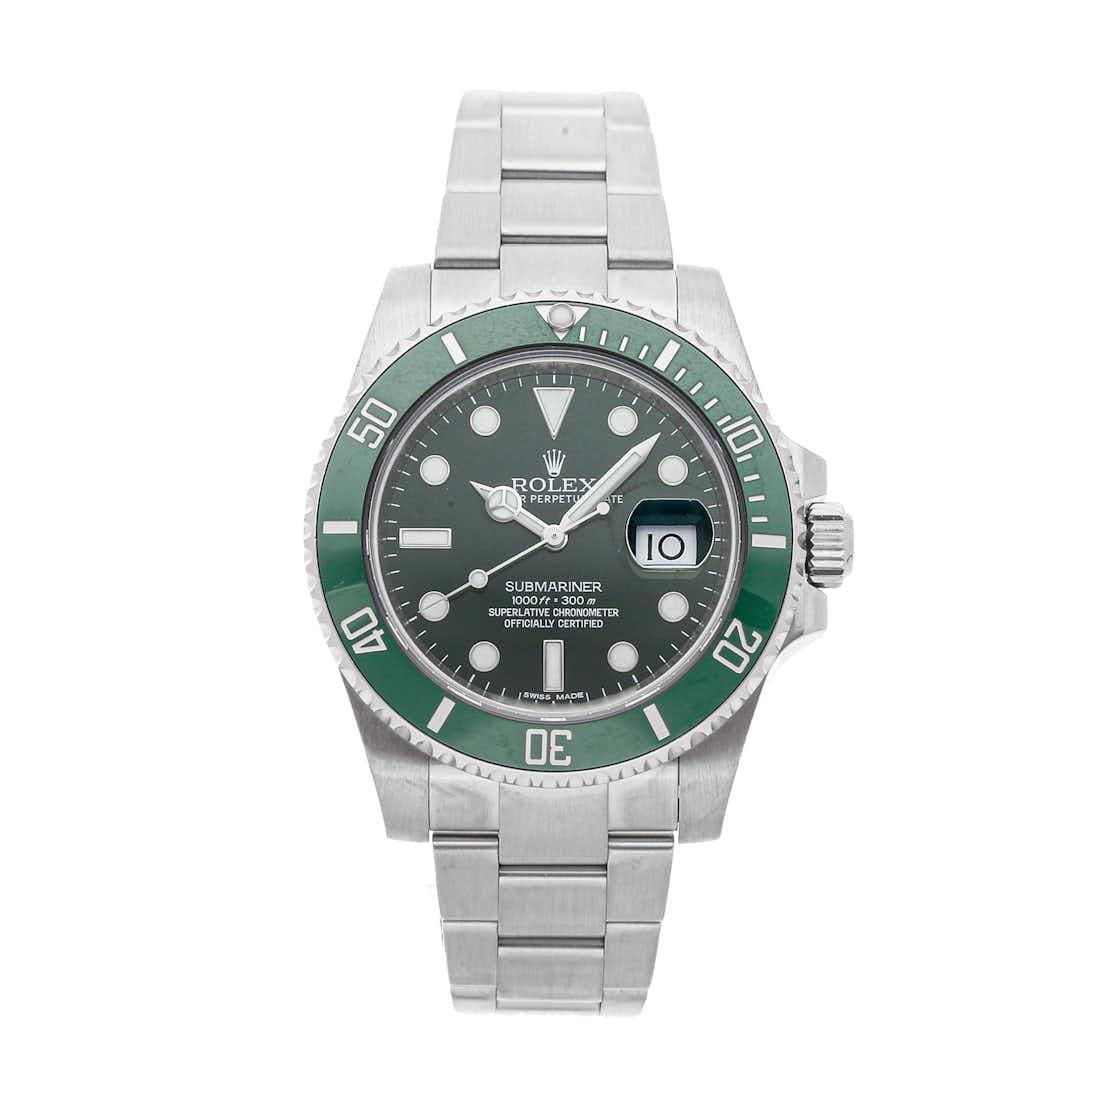 "Rolex Submariner ""Hulk"" 116610LV"